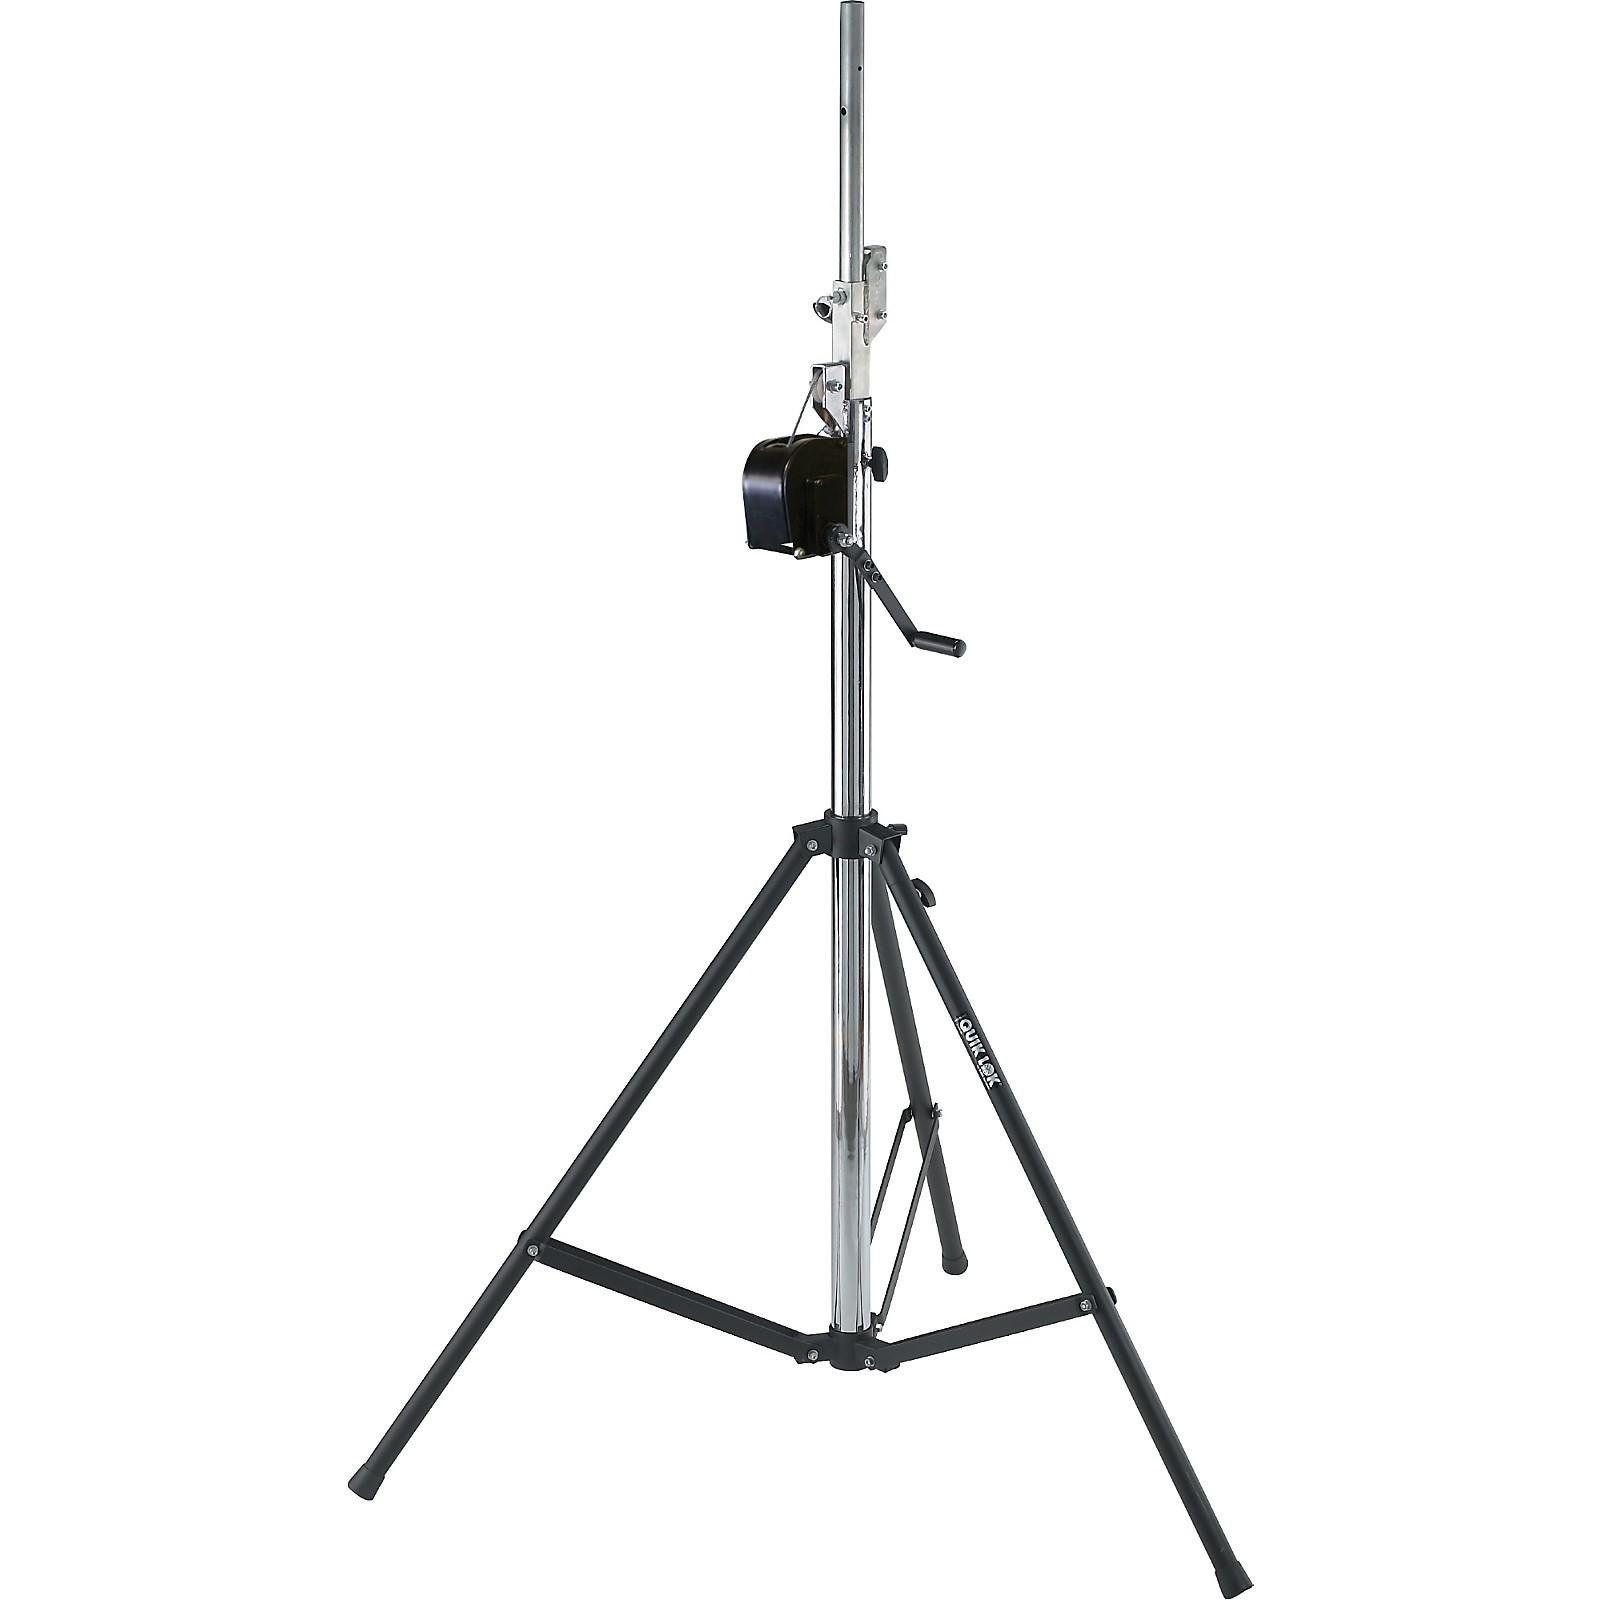 Quik-Lok 13ft. Crank-Up Lighting / Truss Stand